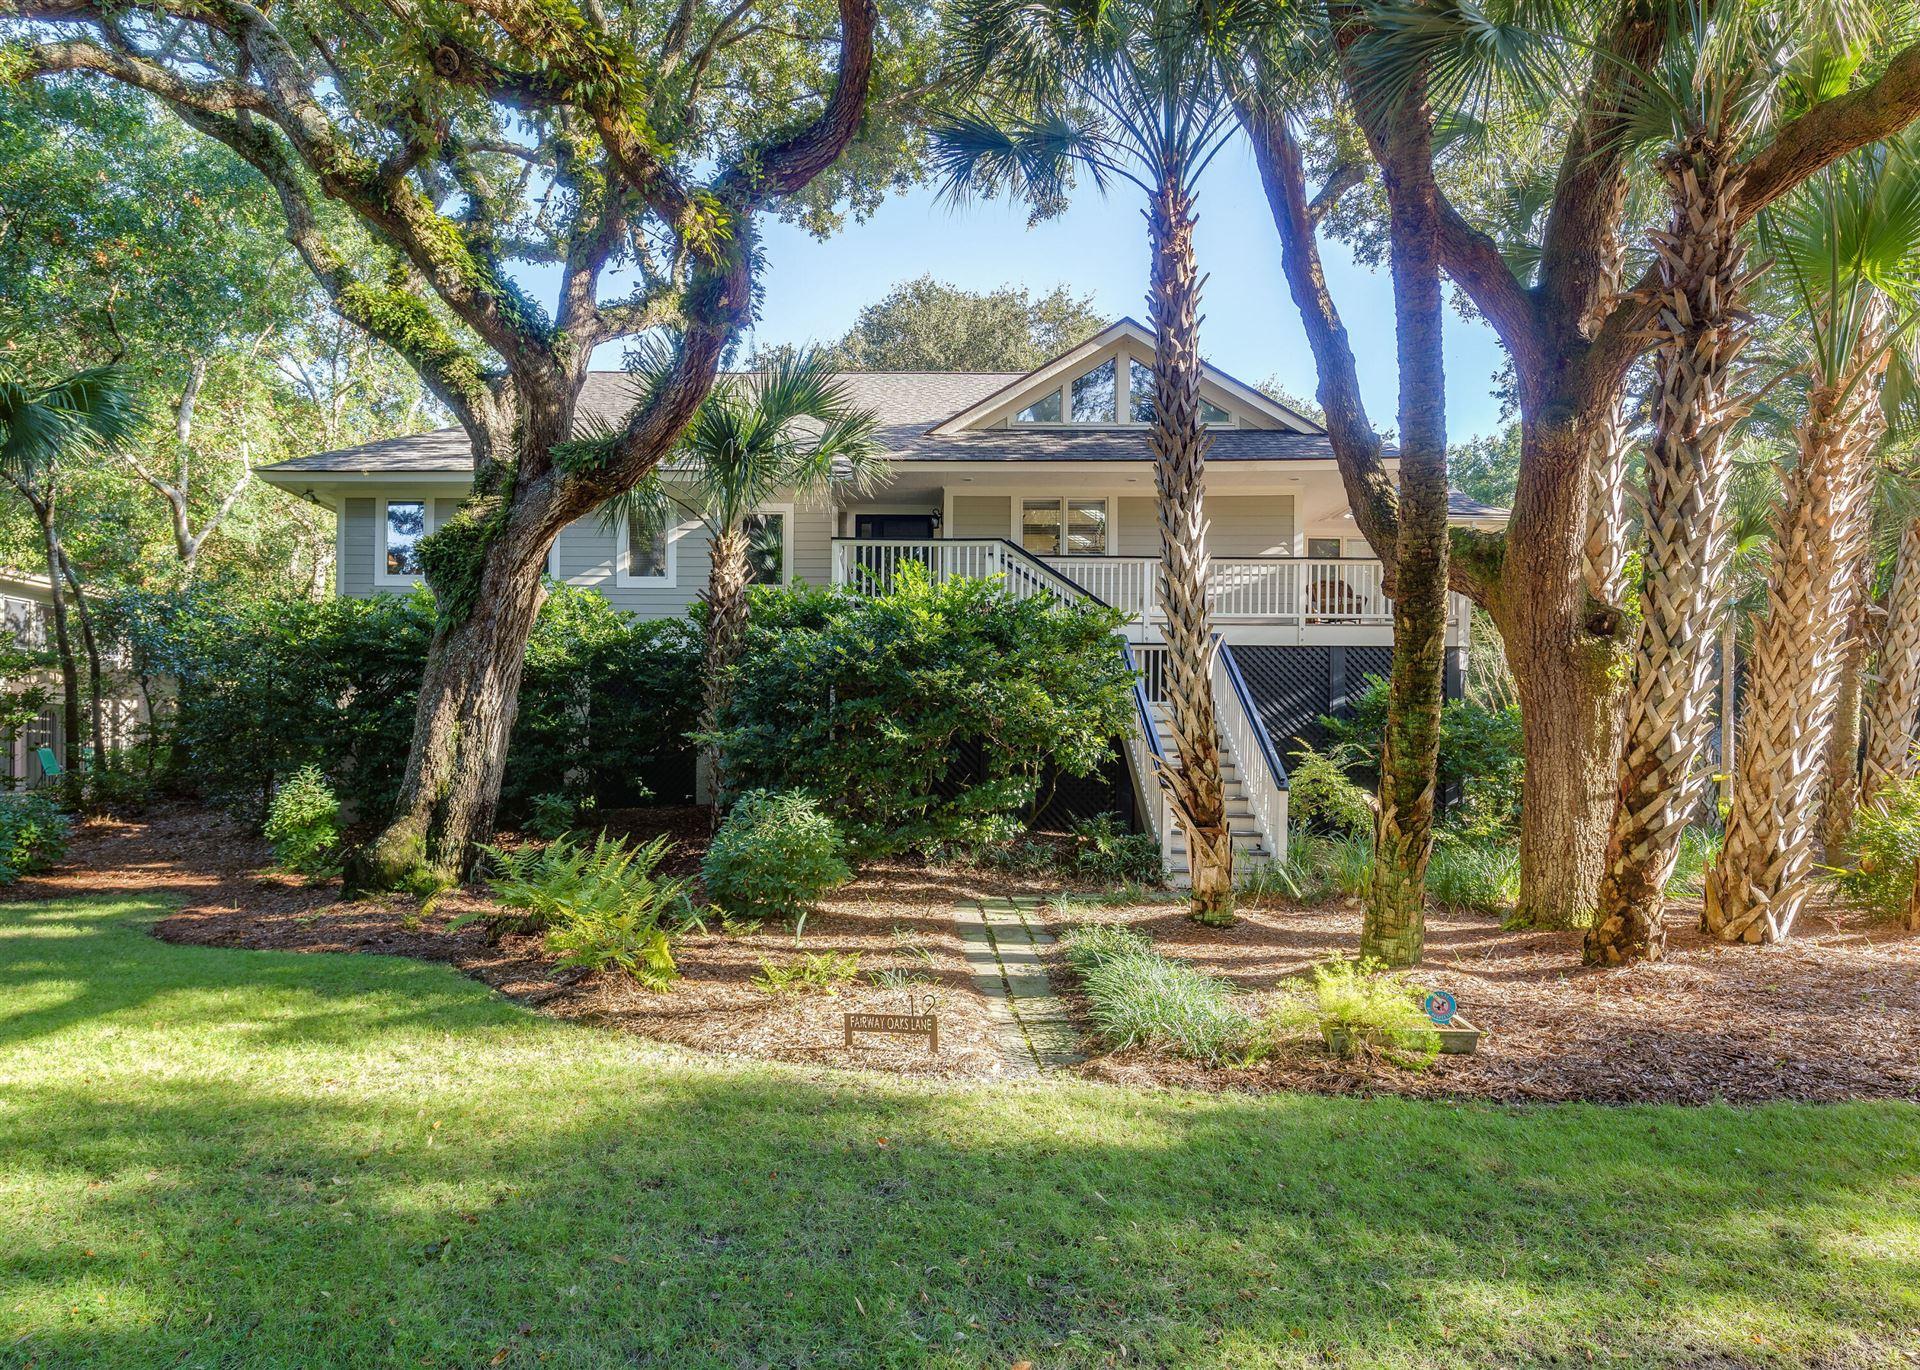 Photo of 12 Fairway Oaks Lane, Isle of Palms, SC 29451 (MLS # 21028630)